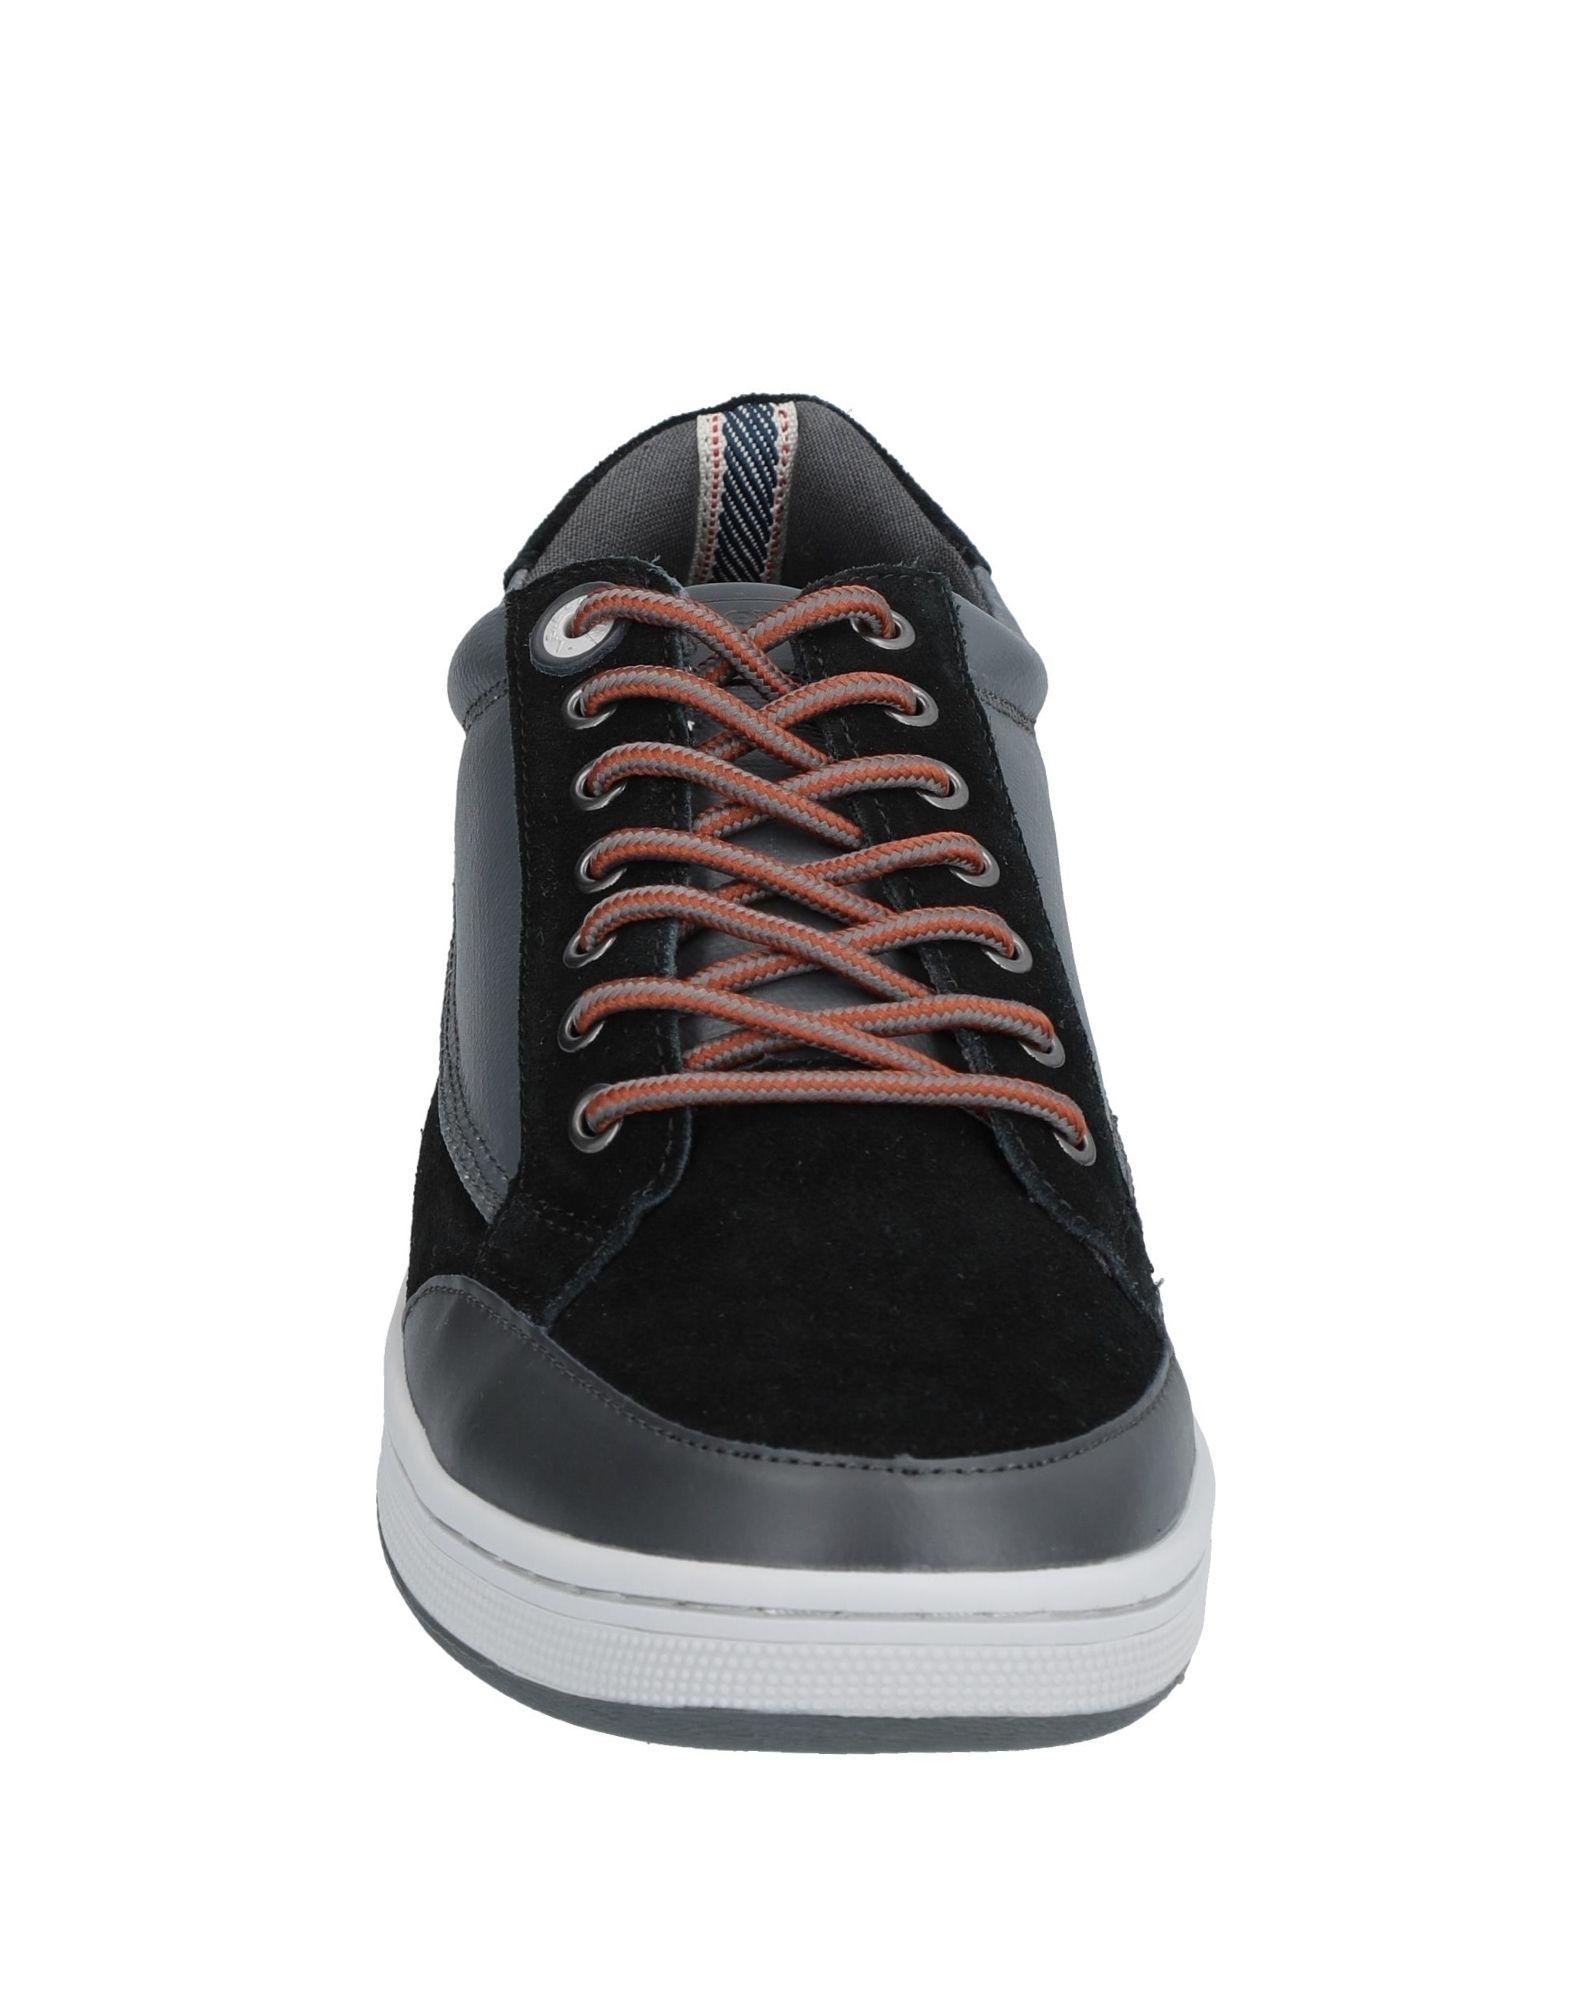 Rabatt echte Schuhe Schuhe Schuhe Levi's Red Tab Sneakers Herren  11535142NW f670c6